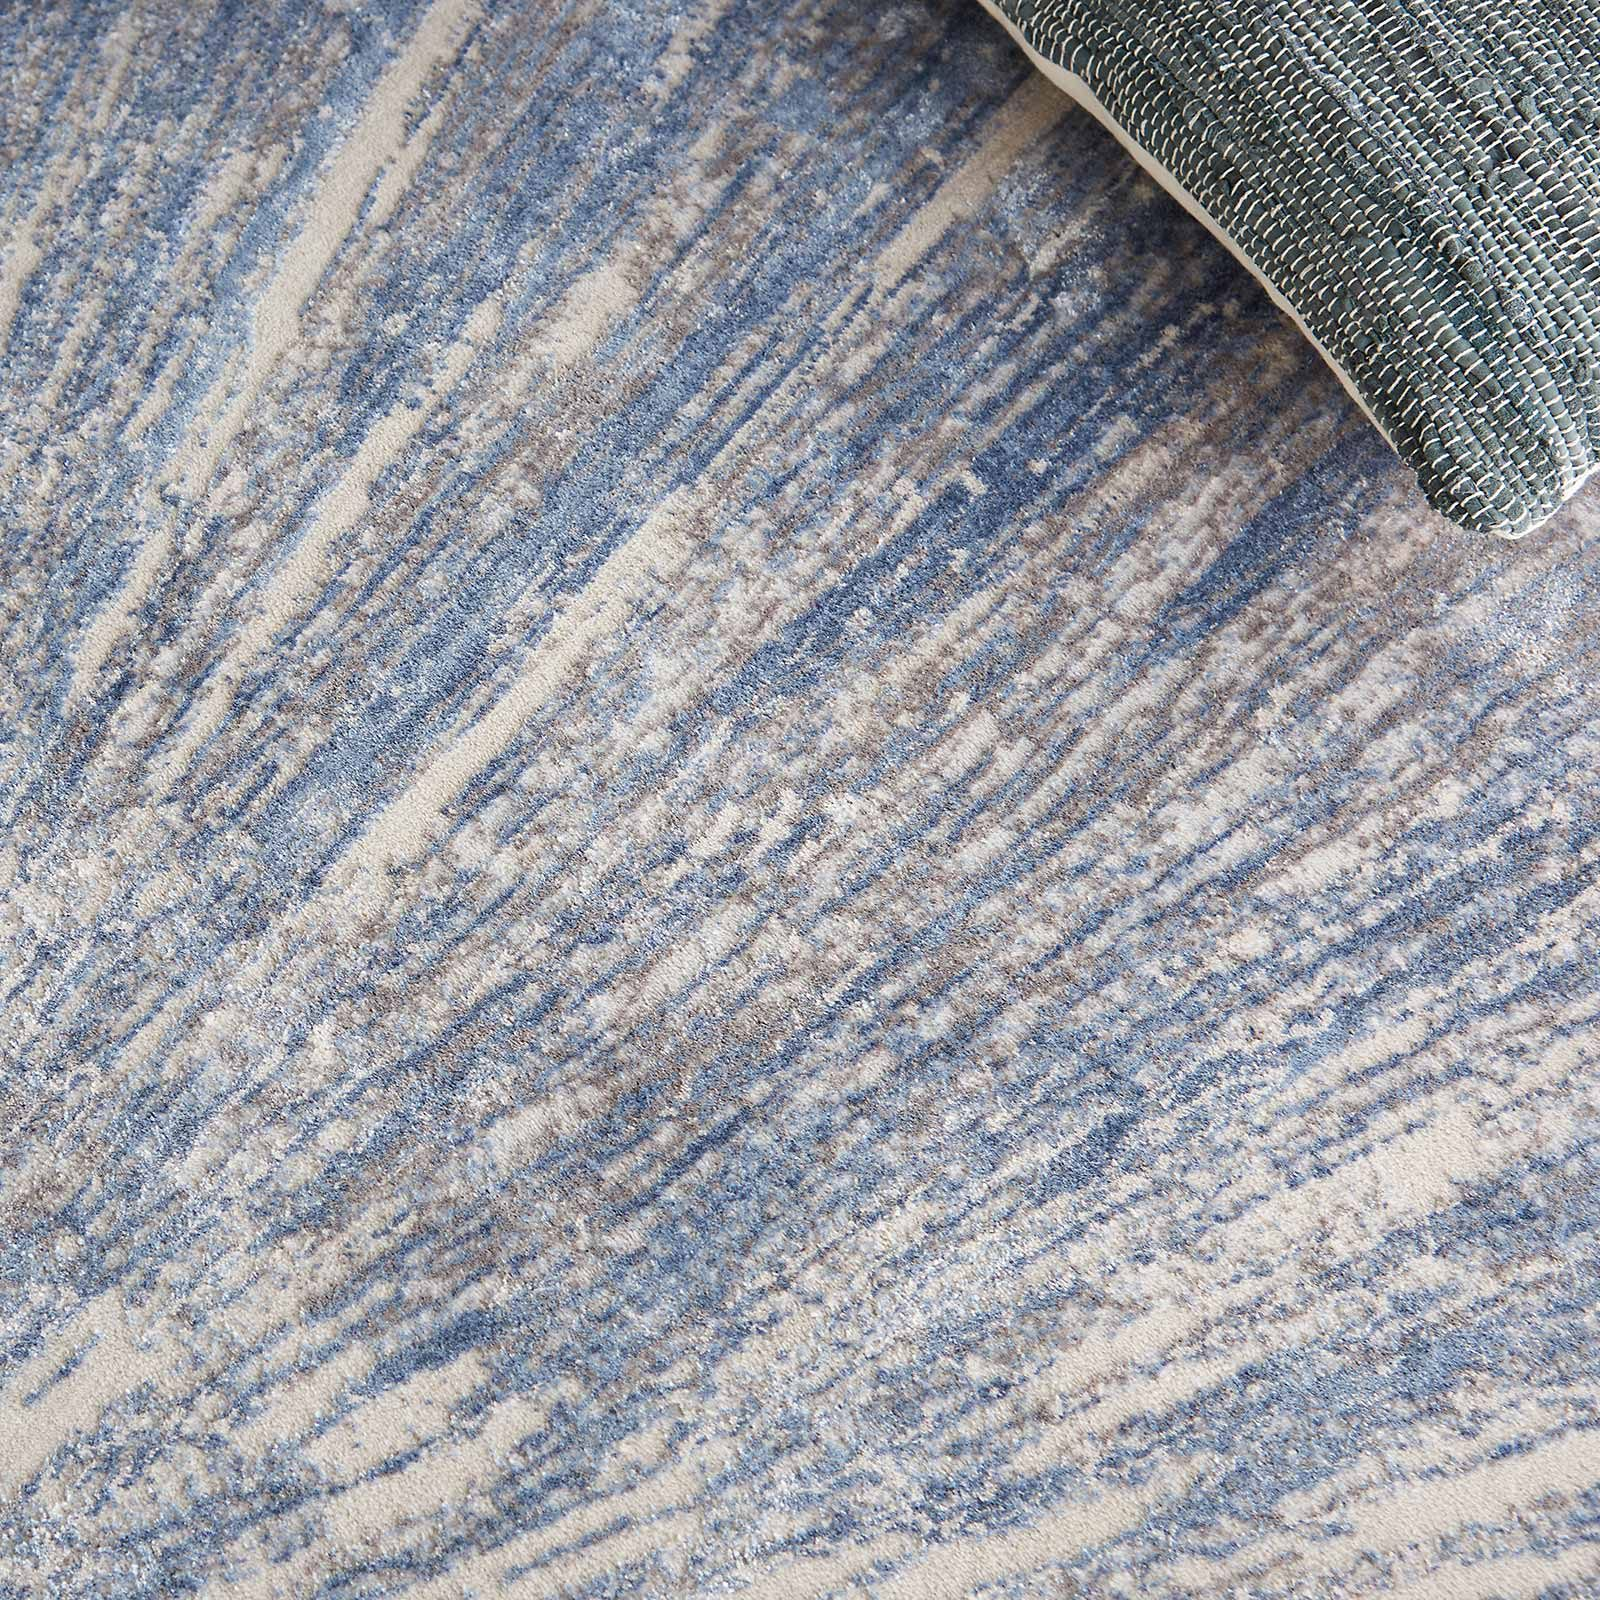 Nourison rug Silky Textures SLY05 BLUE GREY 5x7 099446710222 interior 2 C